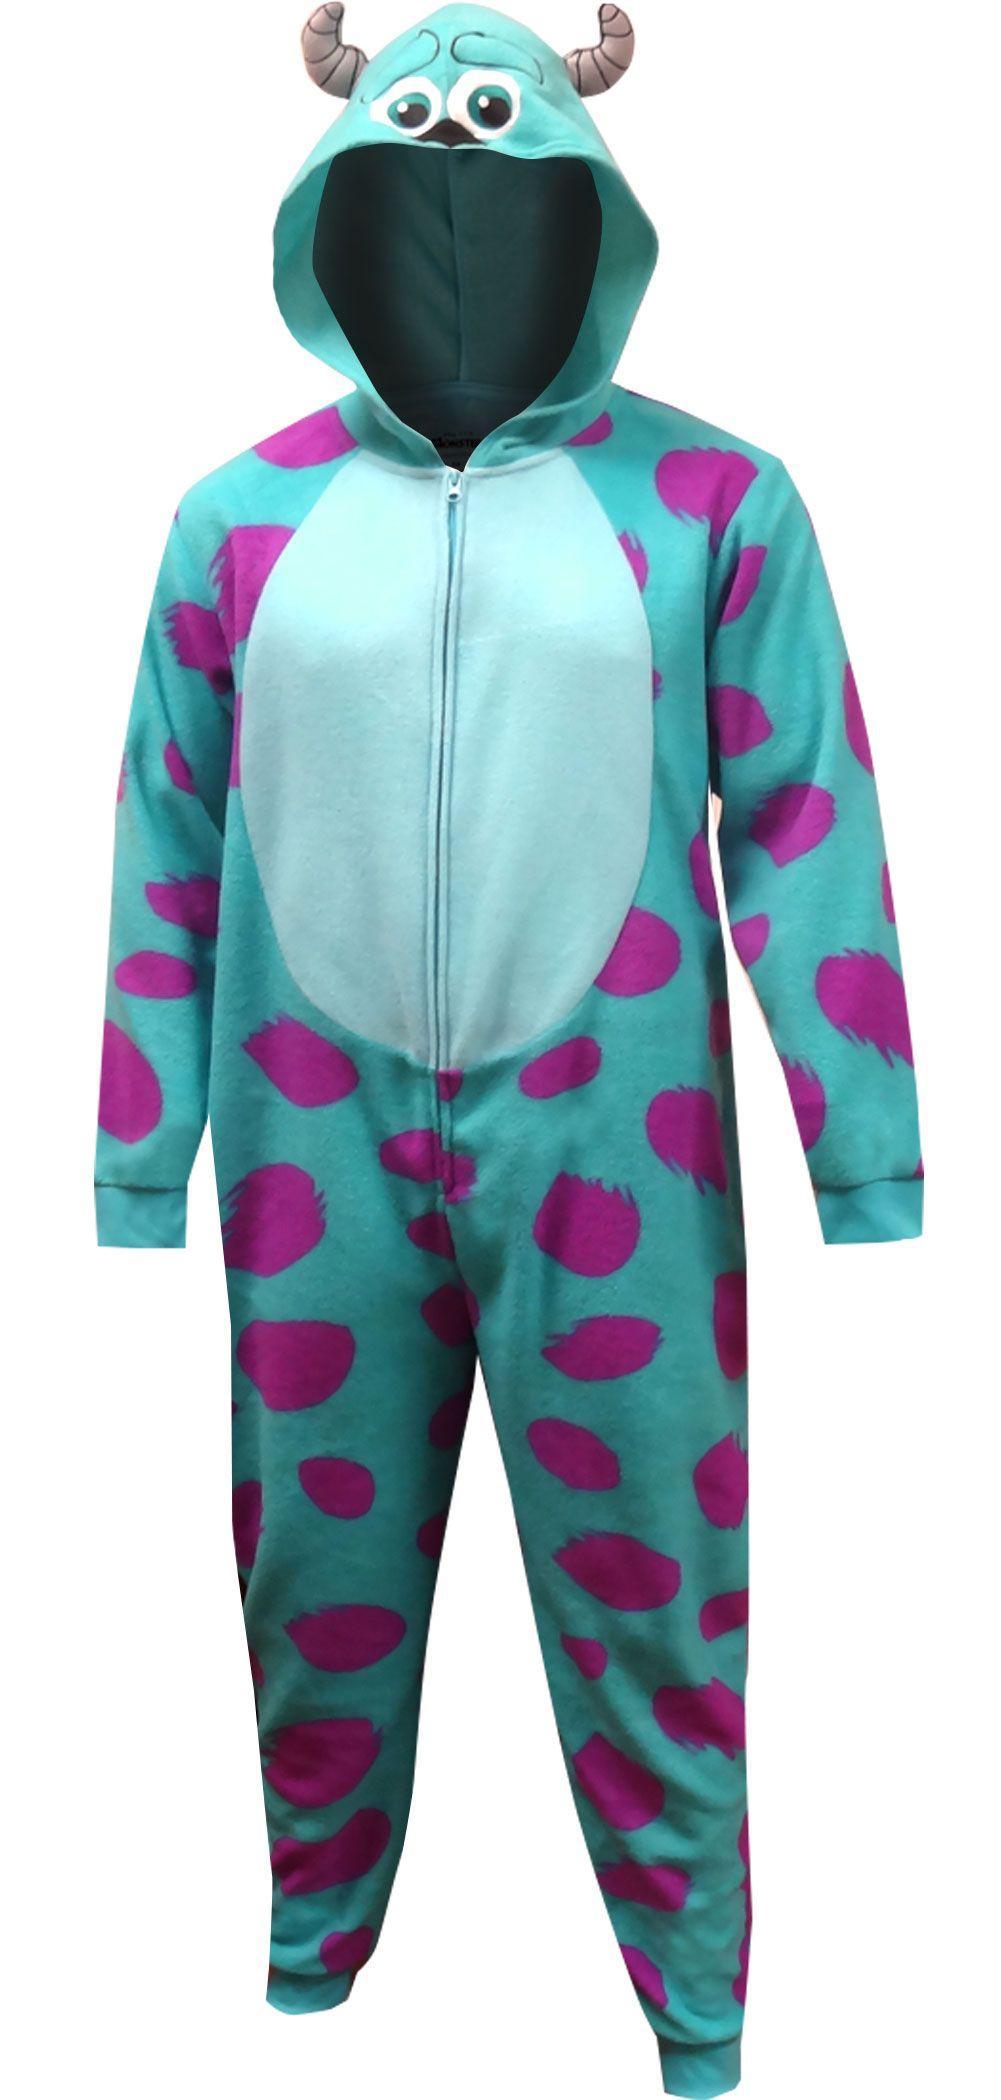 d4890ce30c41 WebUndies.com Disney Pixar Monsters Inc Sulley One Piece Hooded Pajama